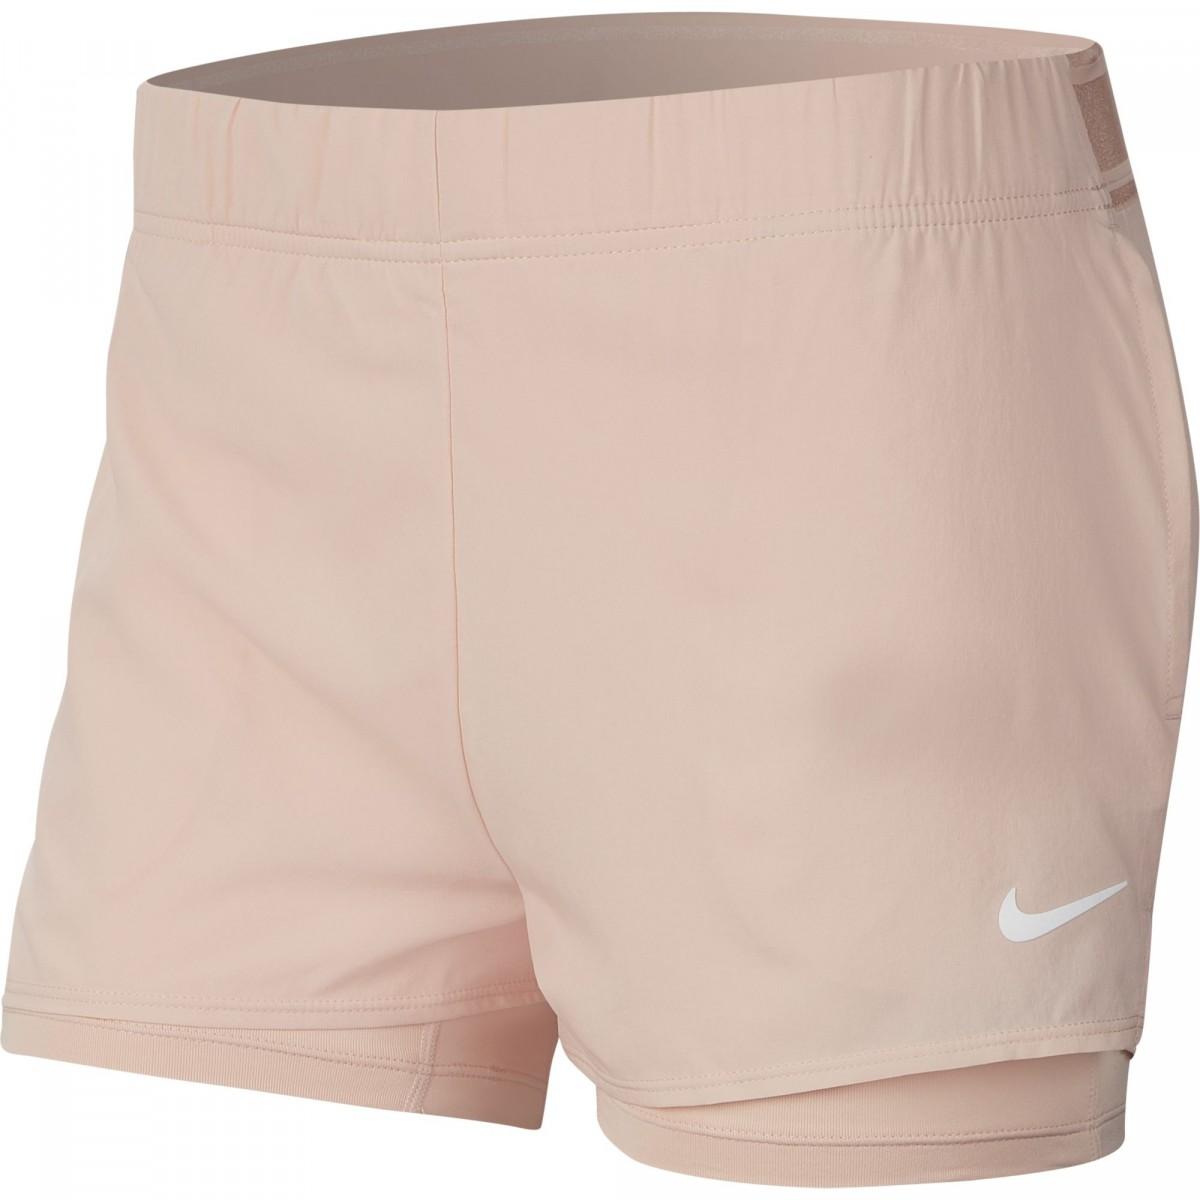 Теннисные шорты женские Nike Court Flex Short washed coral/white